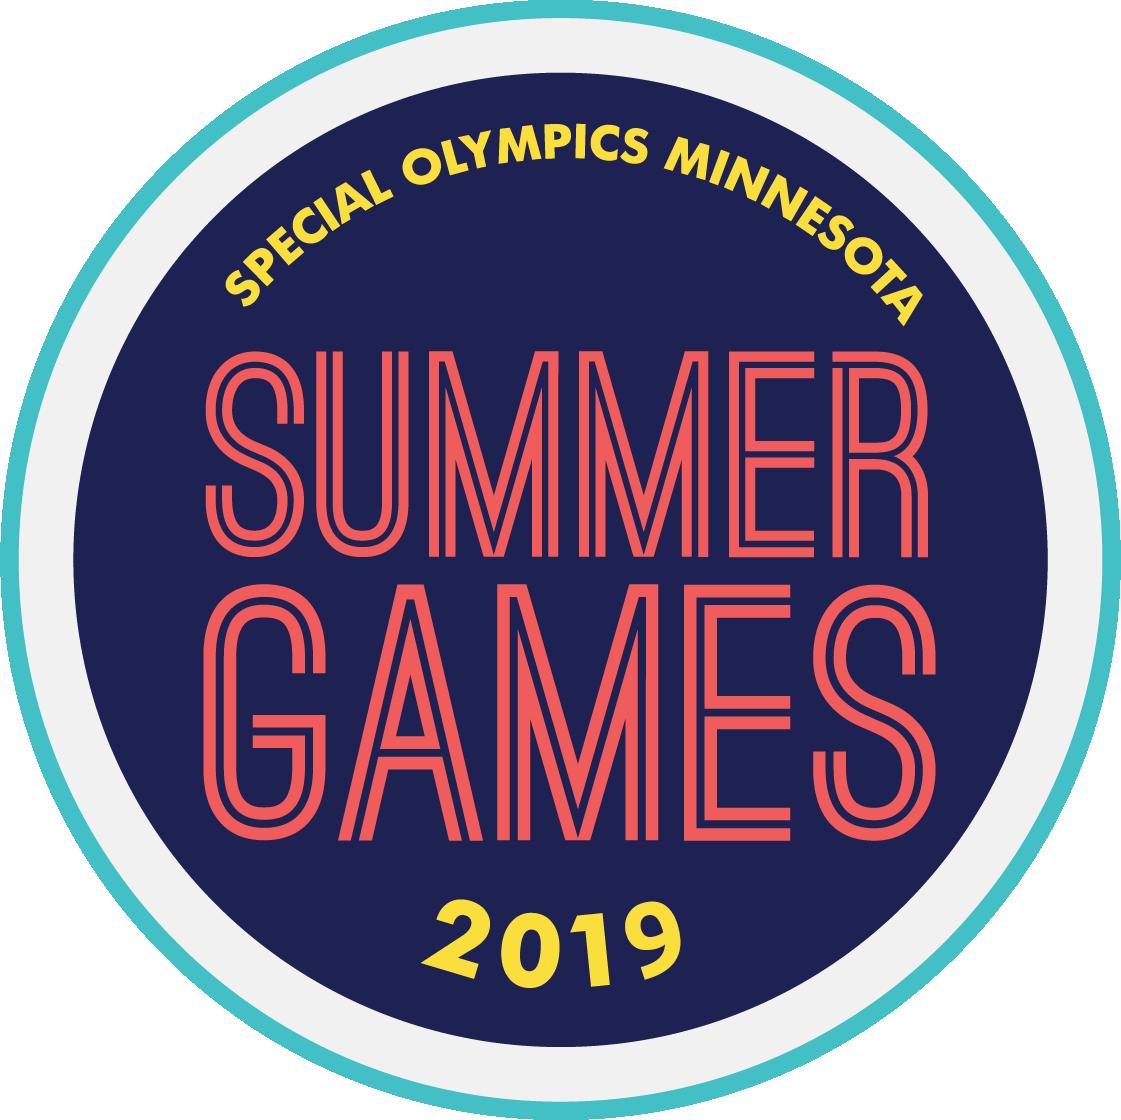 2019 Summer Games logo